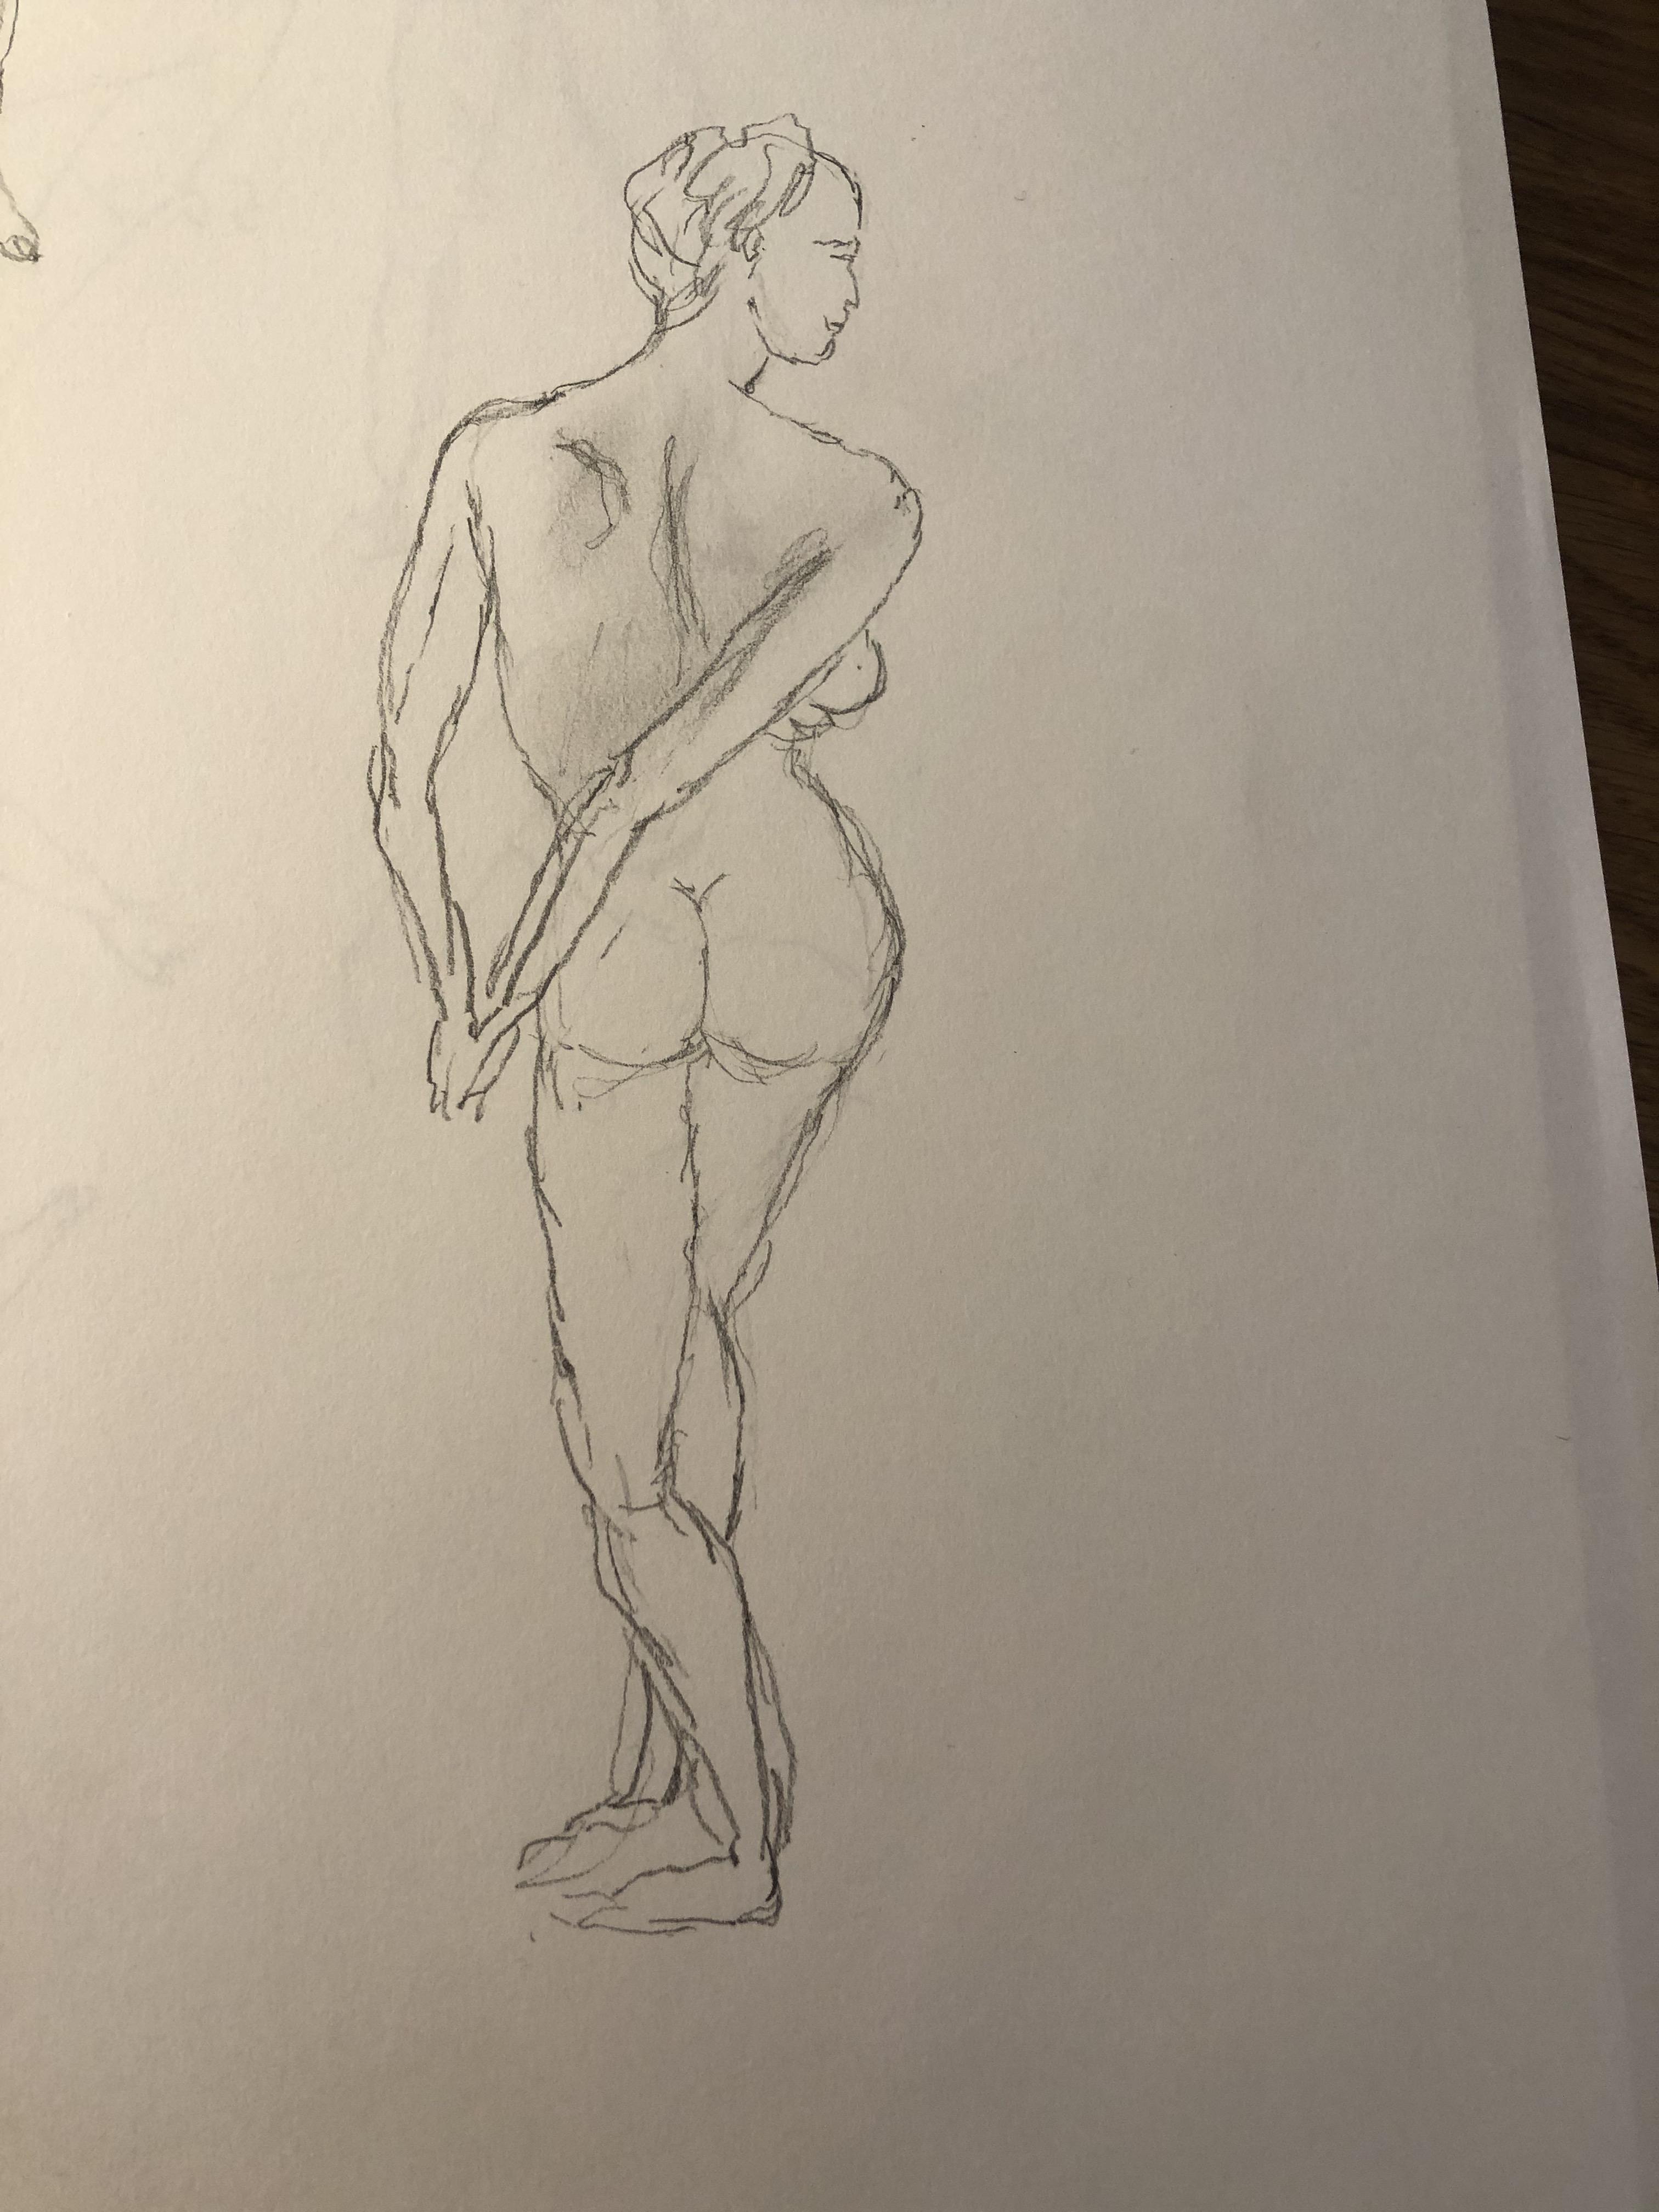 �tude dessin crayon papier dos femme  cours de dessin